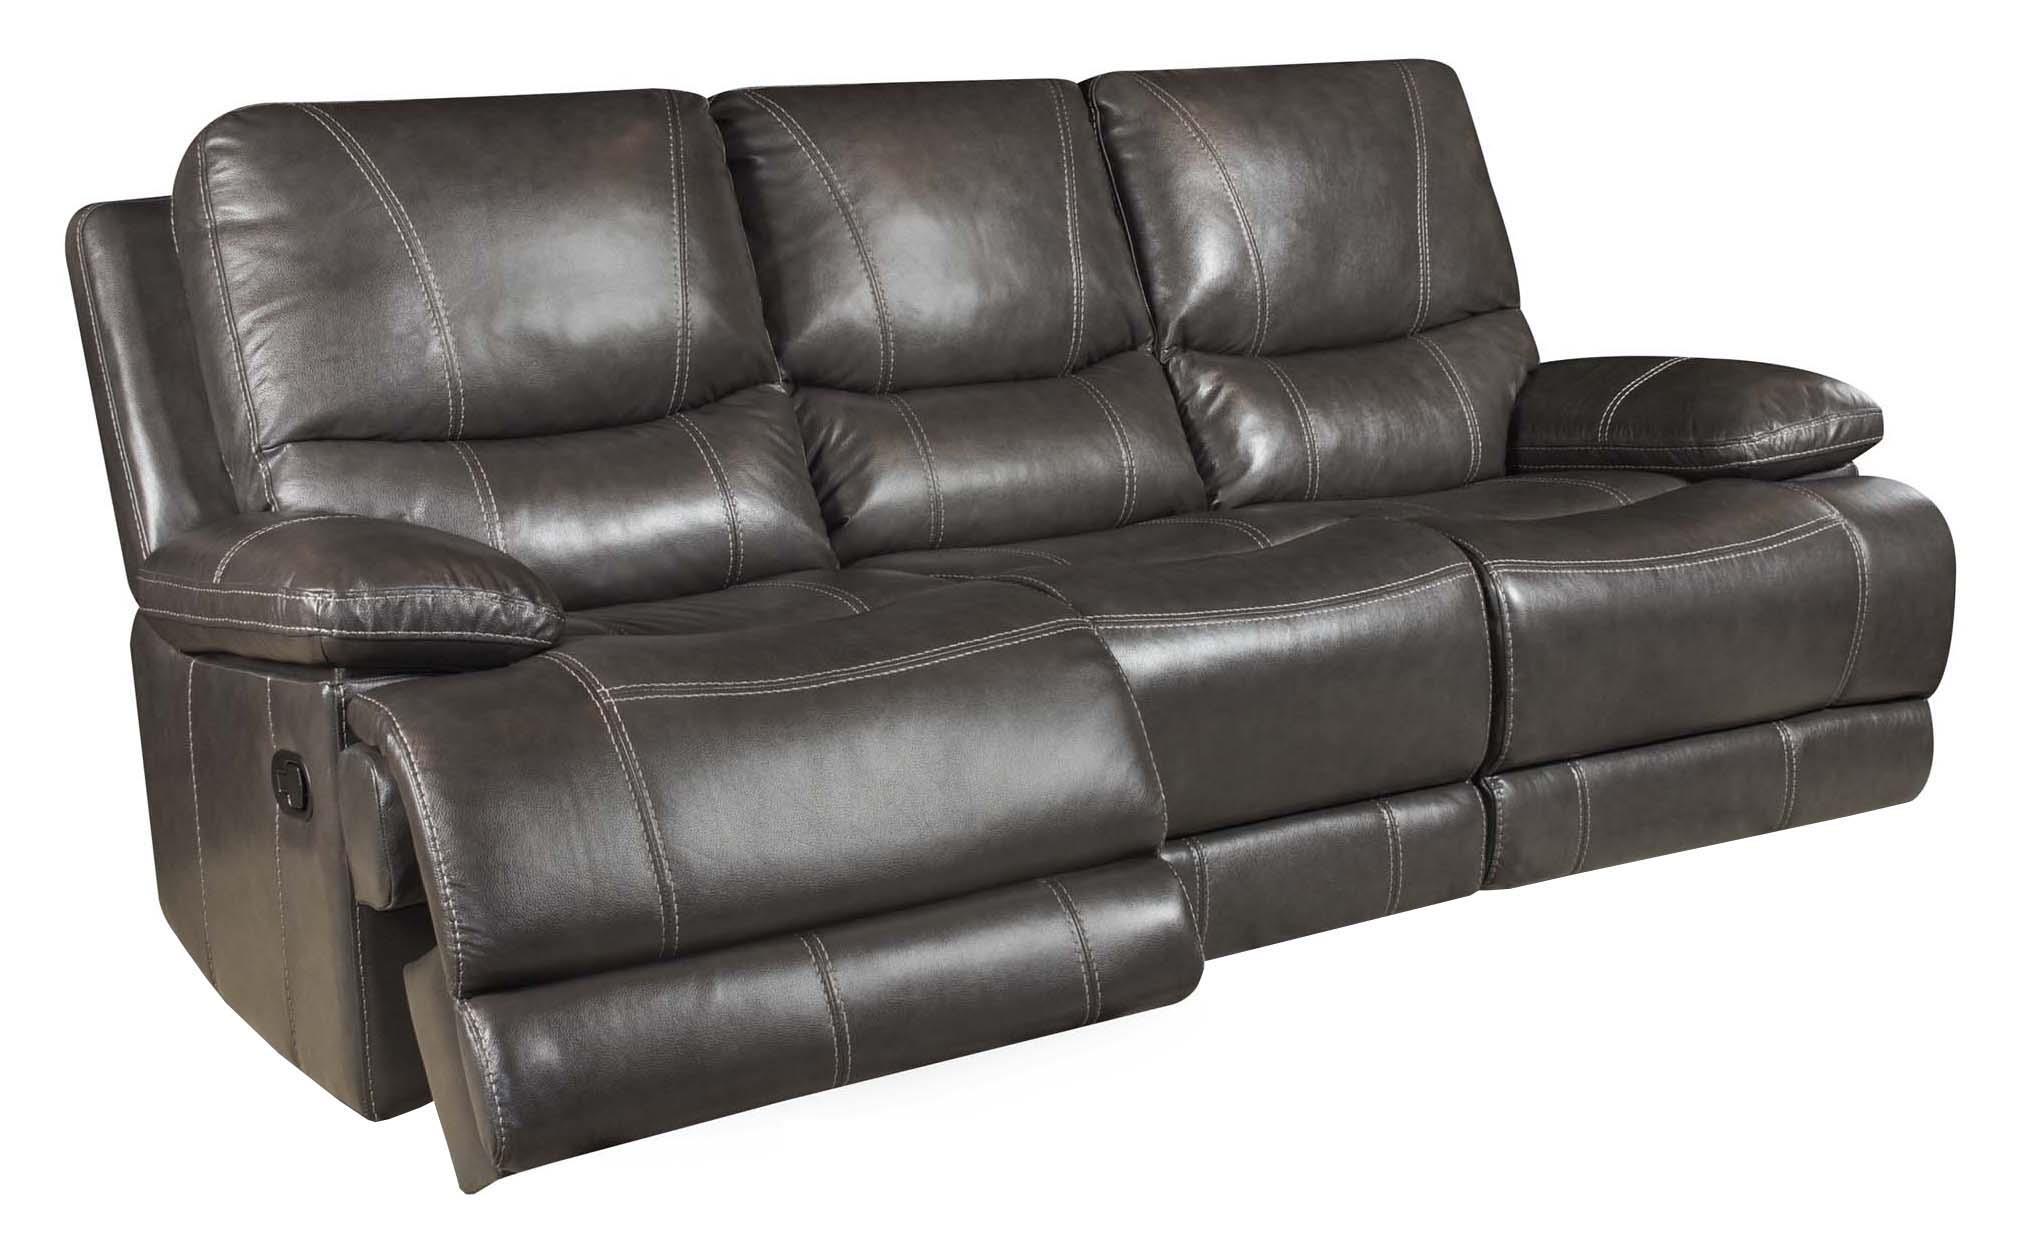 Corinthian Brooklyn Charcoal 42801 30 Brooklyn Charcoal Leather Reclining  Sofa